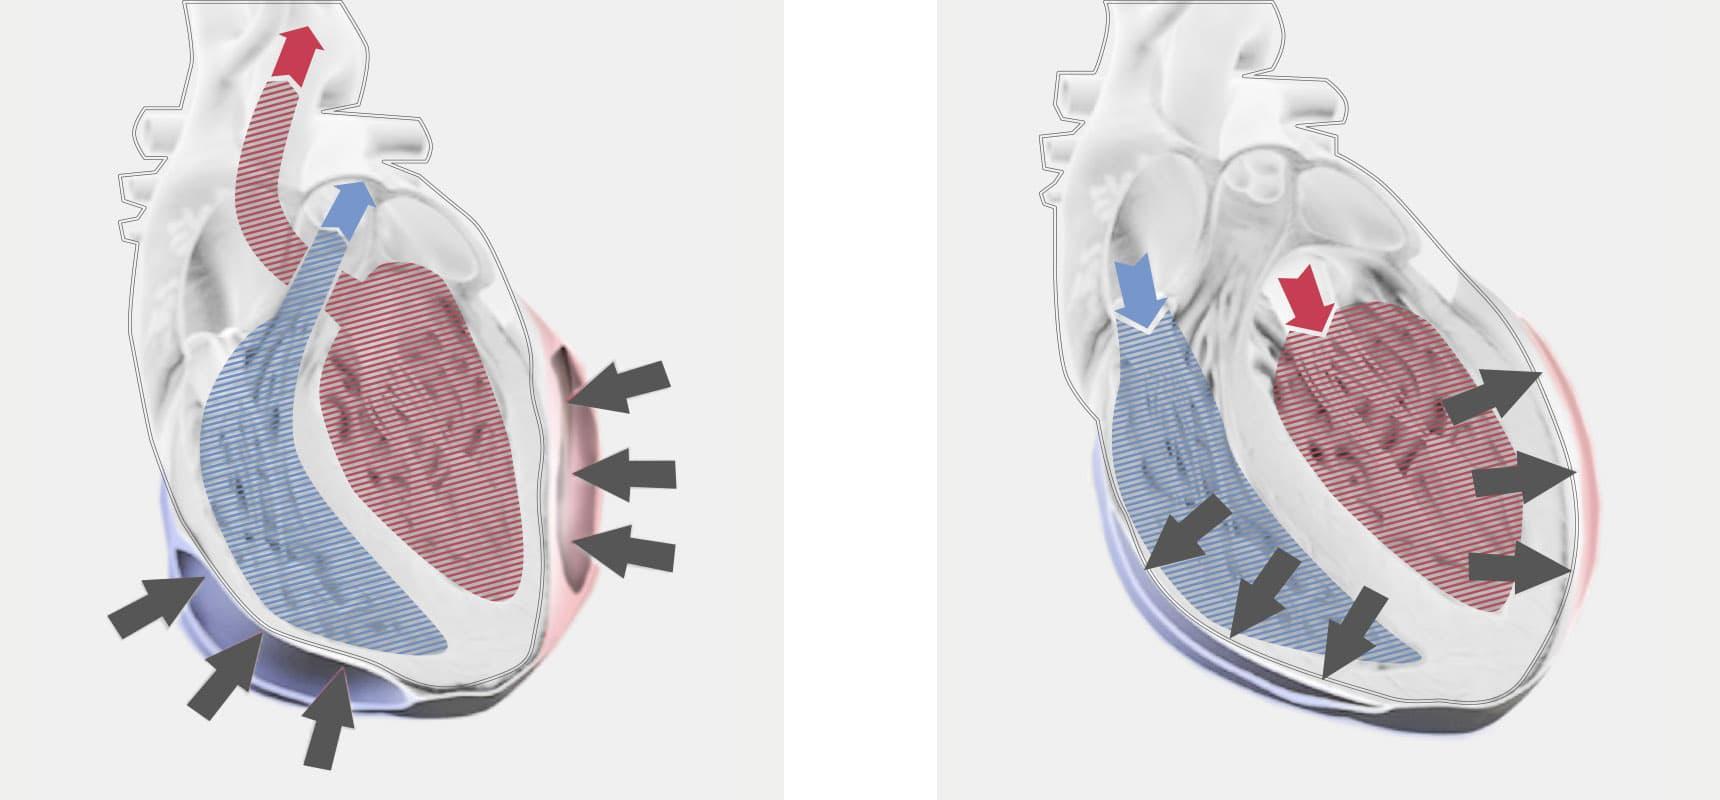 Mechanische Herzunterstützung